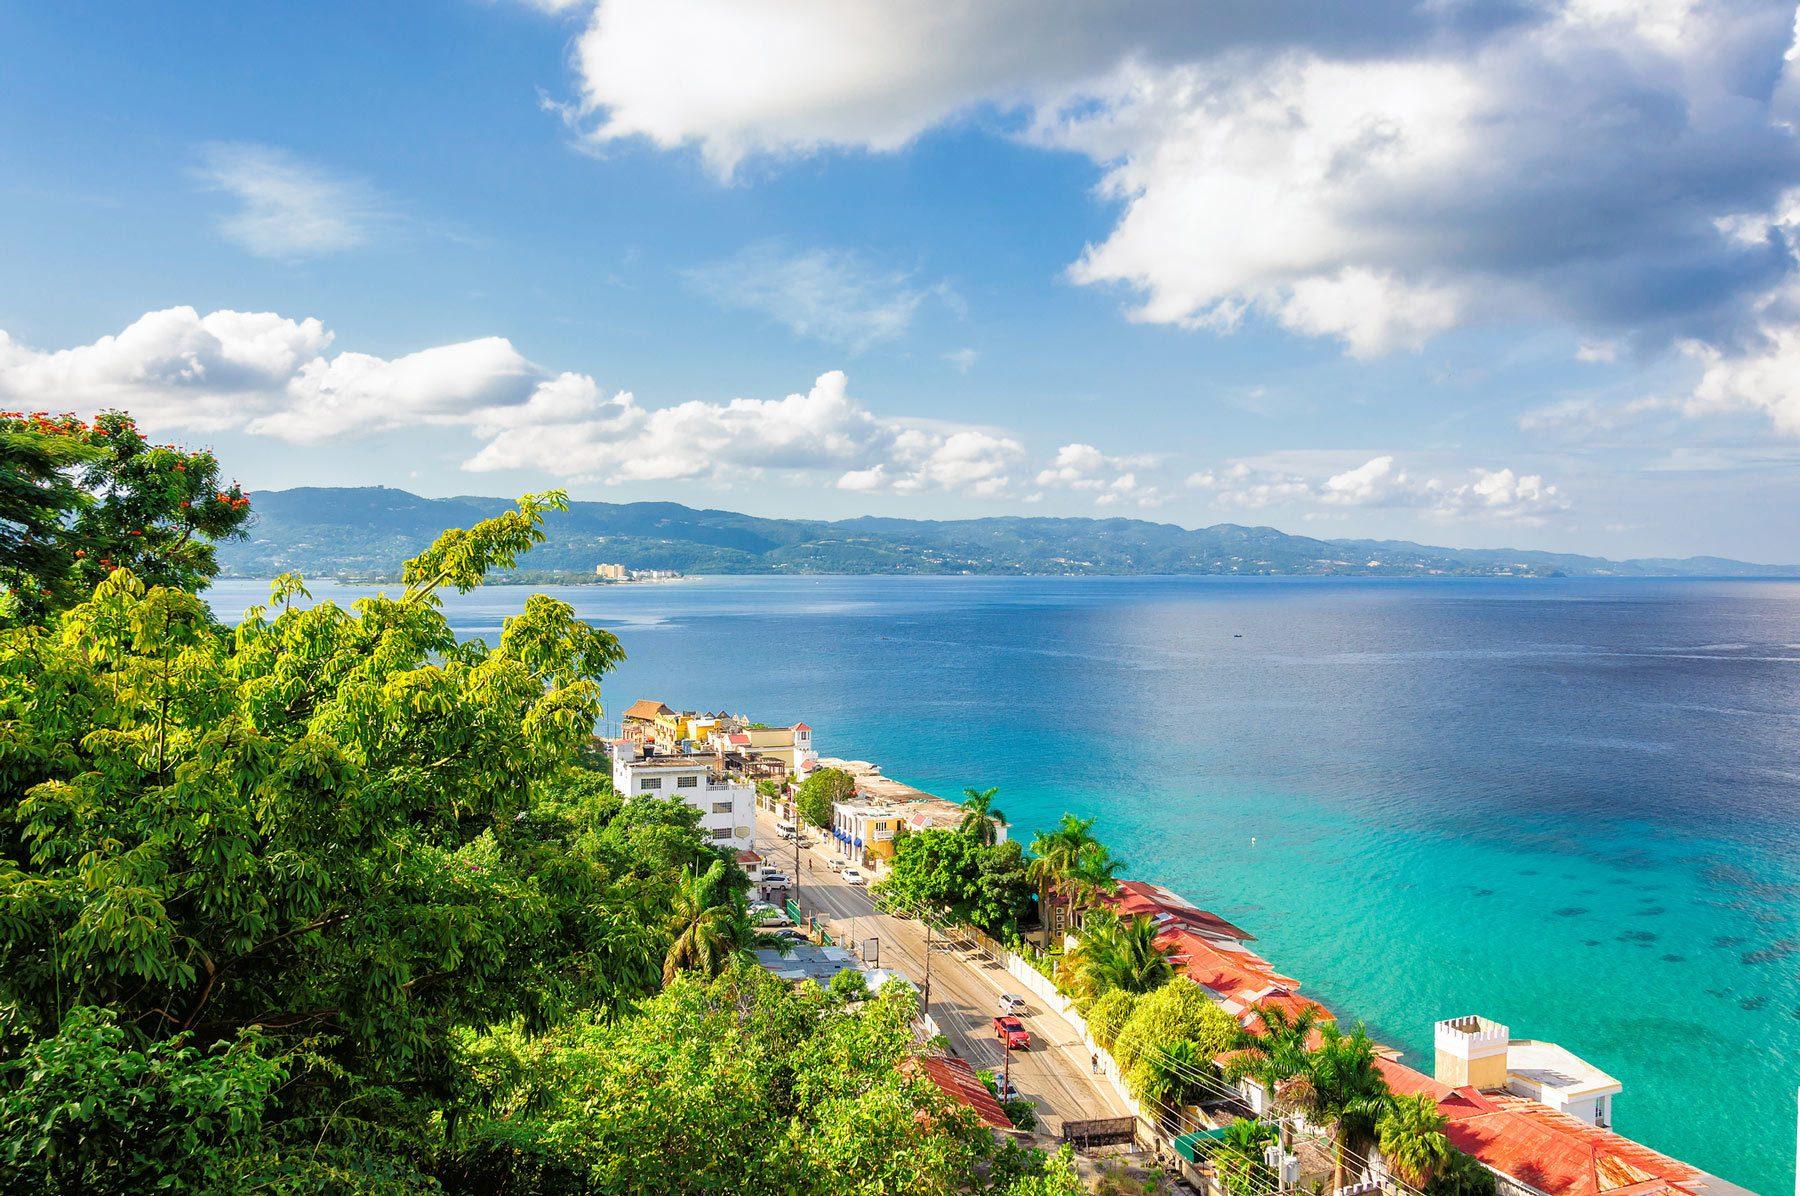 TMG 2021 Incentive Trip: Jamaica